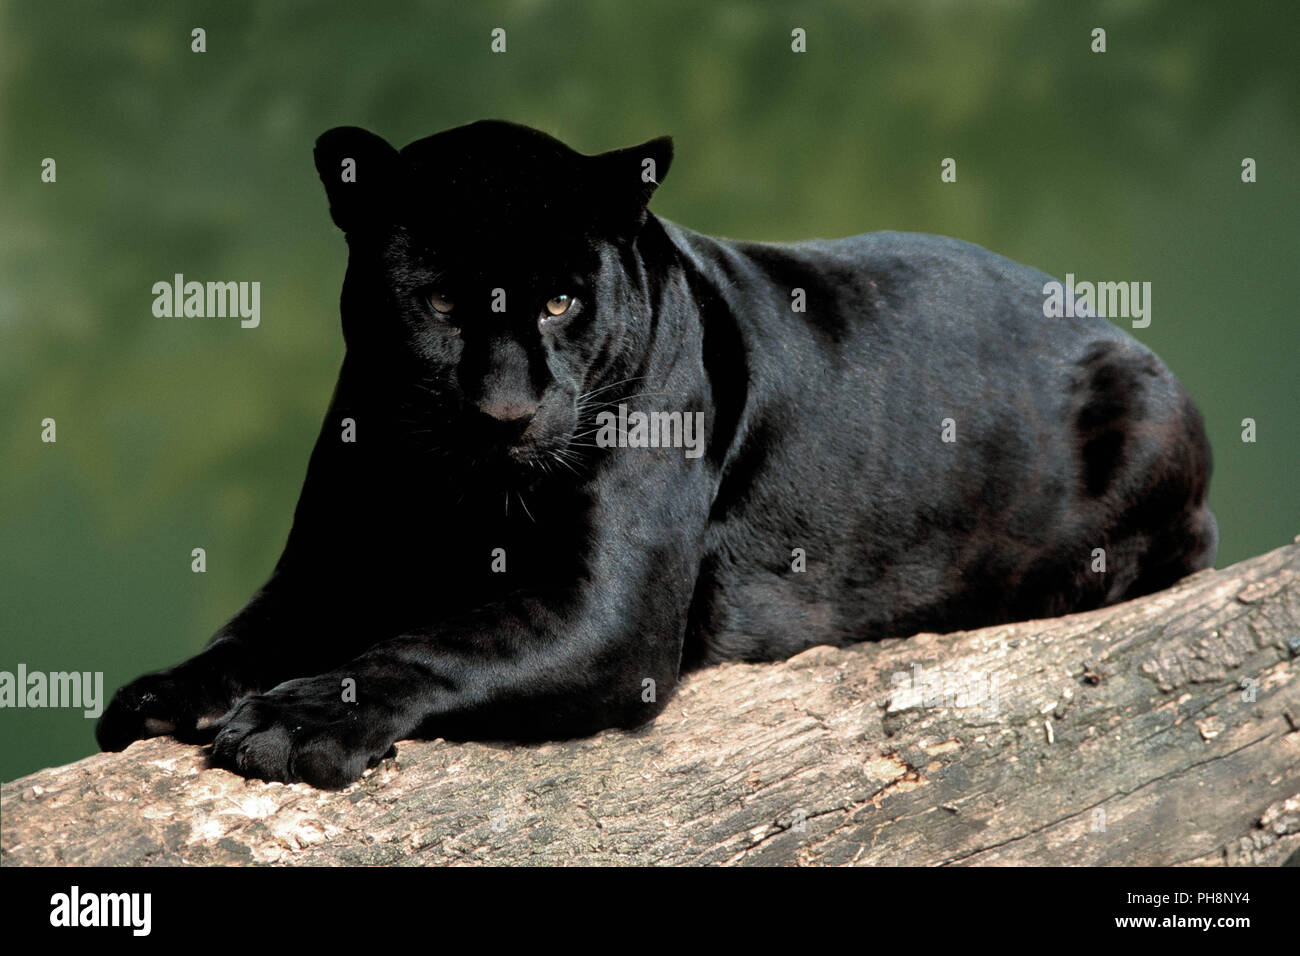 Black Jaguar Animal High Resolution Stock Photography And Images Alamy